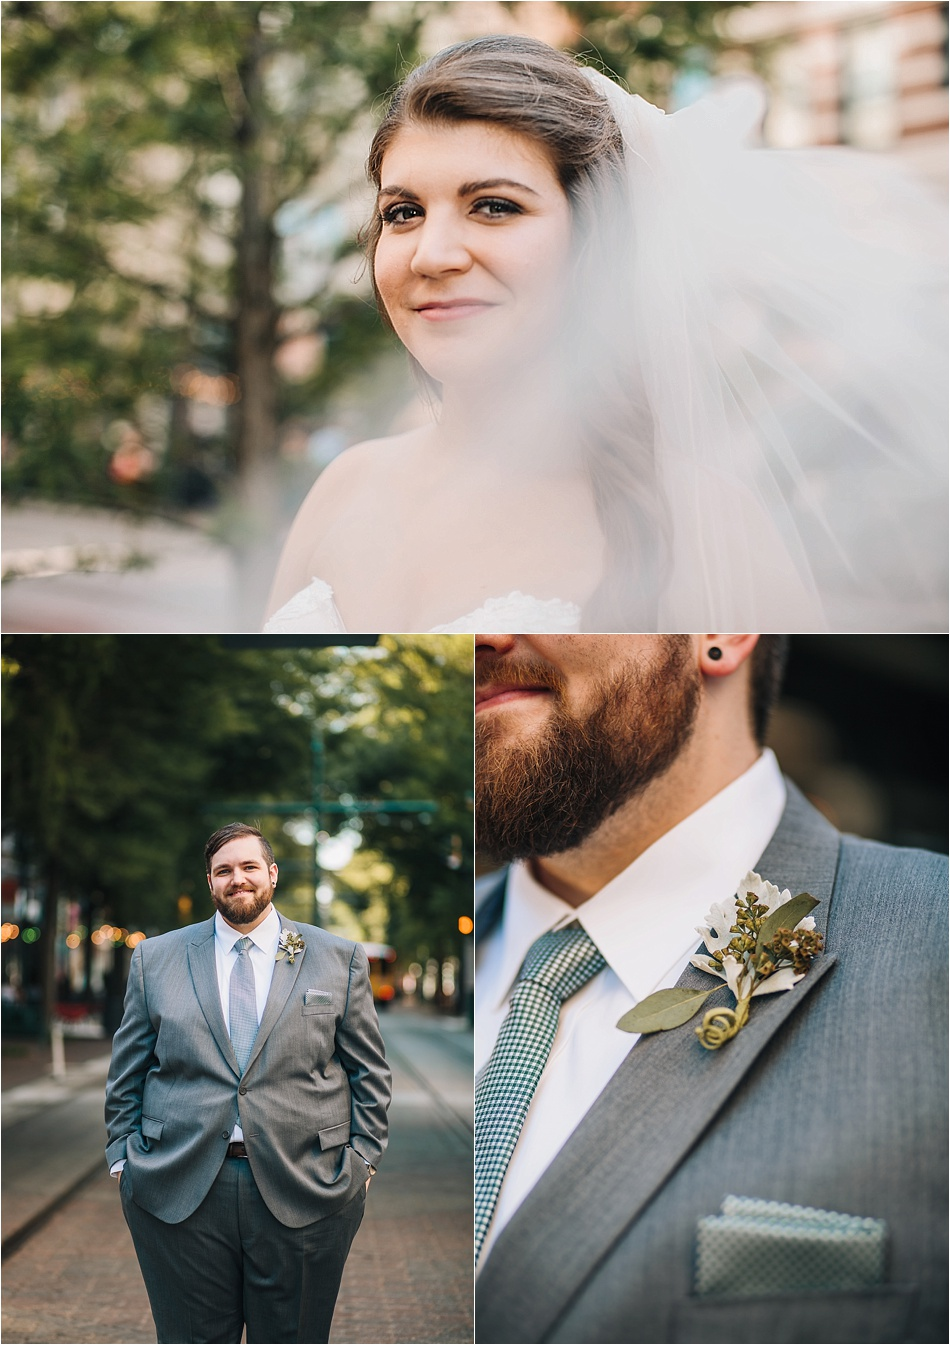 CK-Photo-Nashville-Wedding-Photographer-_0019.jpg